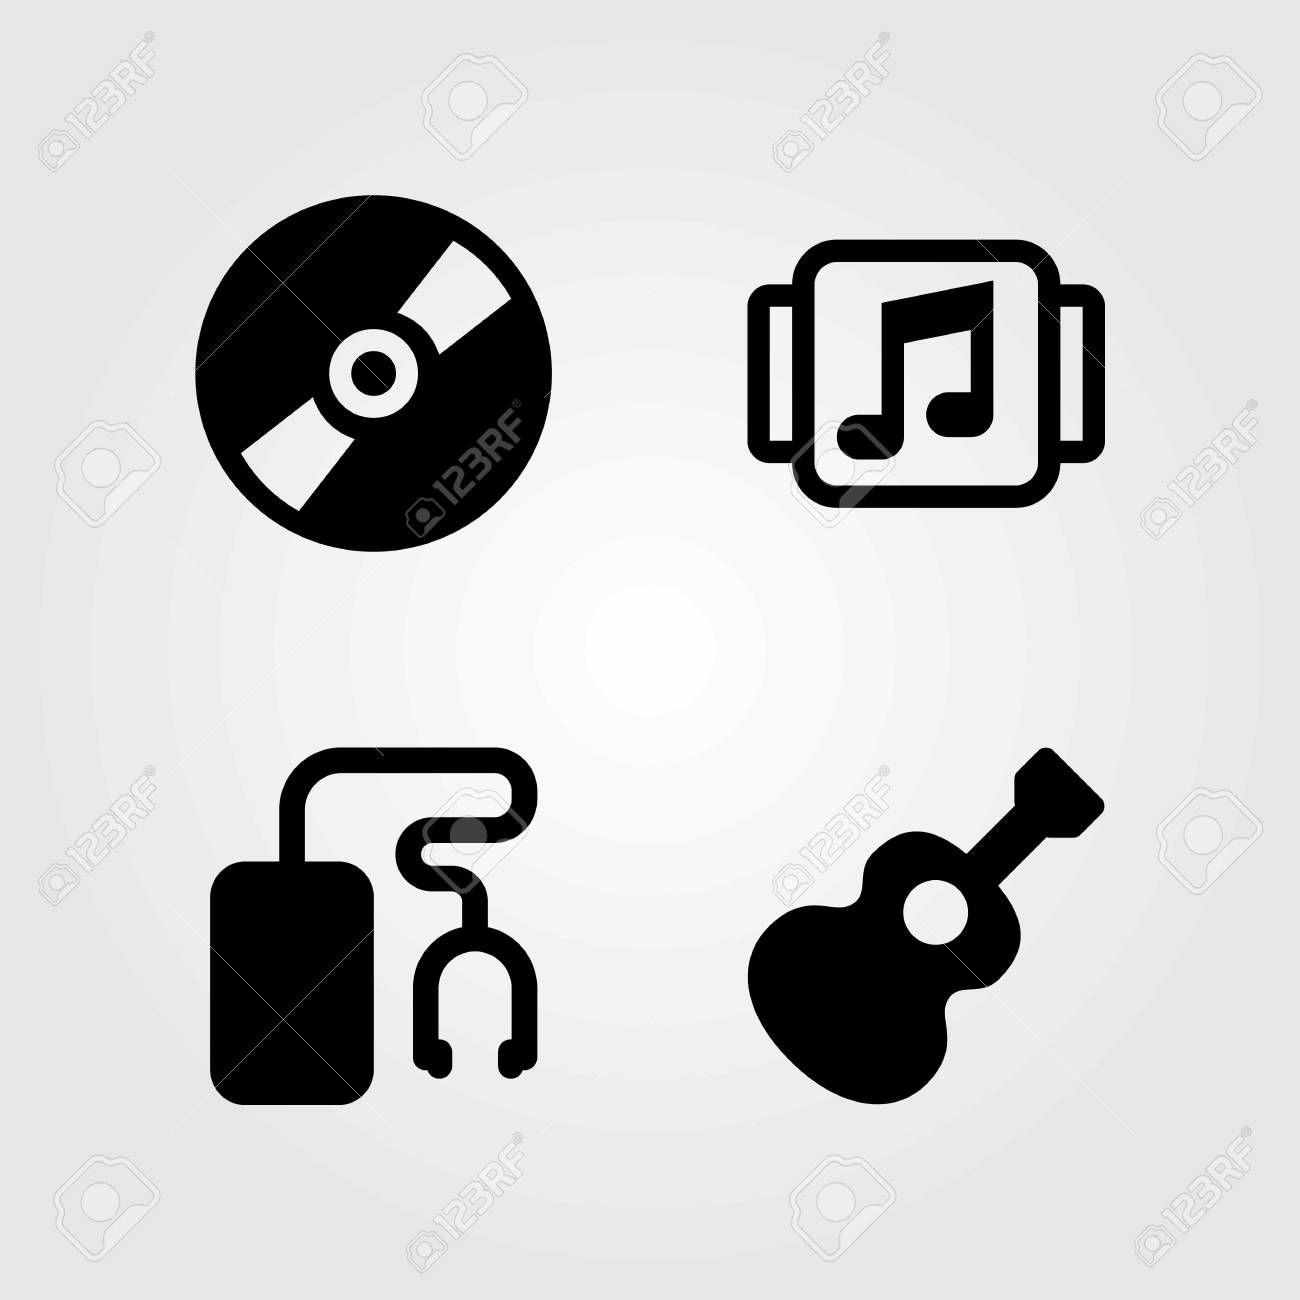 Multimedia Vector Icons Set Guitar Compact Disc And Music Player Illustration Affiliate Set Gu Graphic Design Portfolio Print Icon Set Vector Icon Set